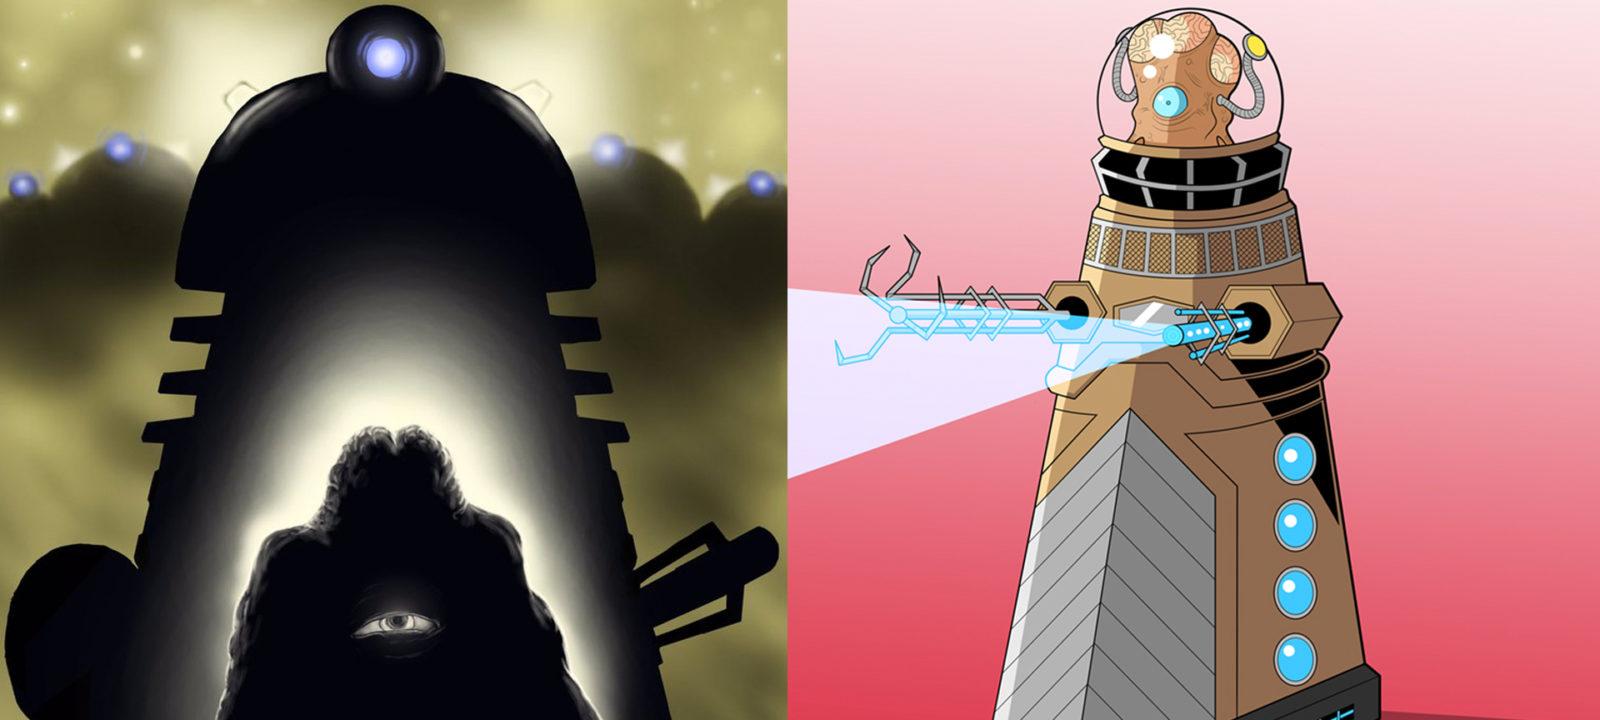 Scott Wauchop and Owenoak's Daleks (Photo: Tumblr)